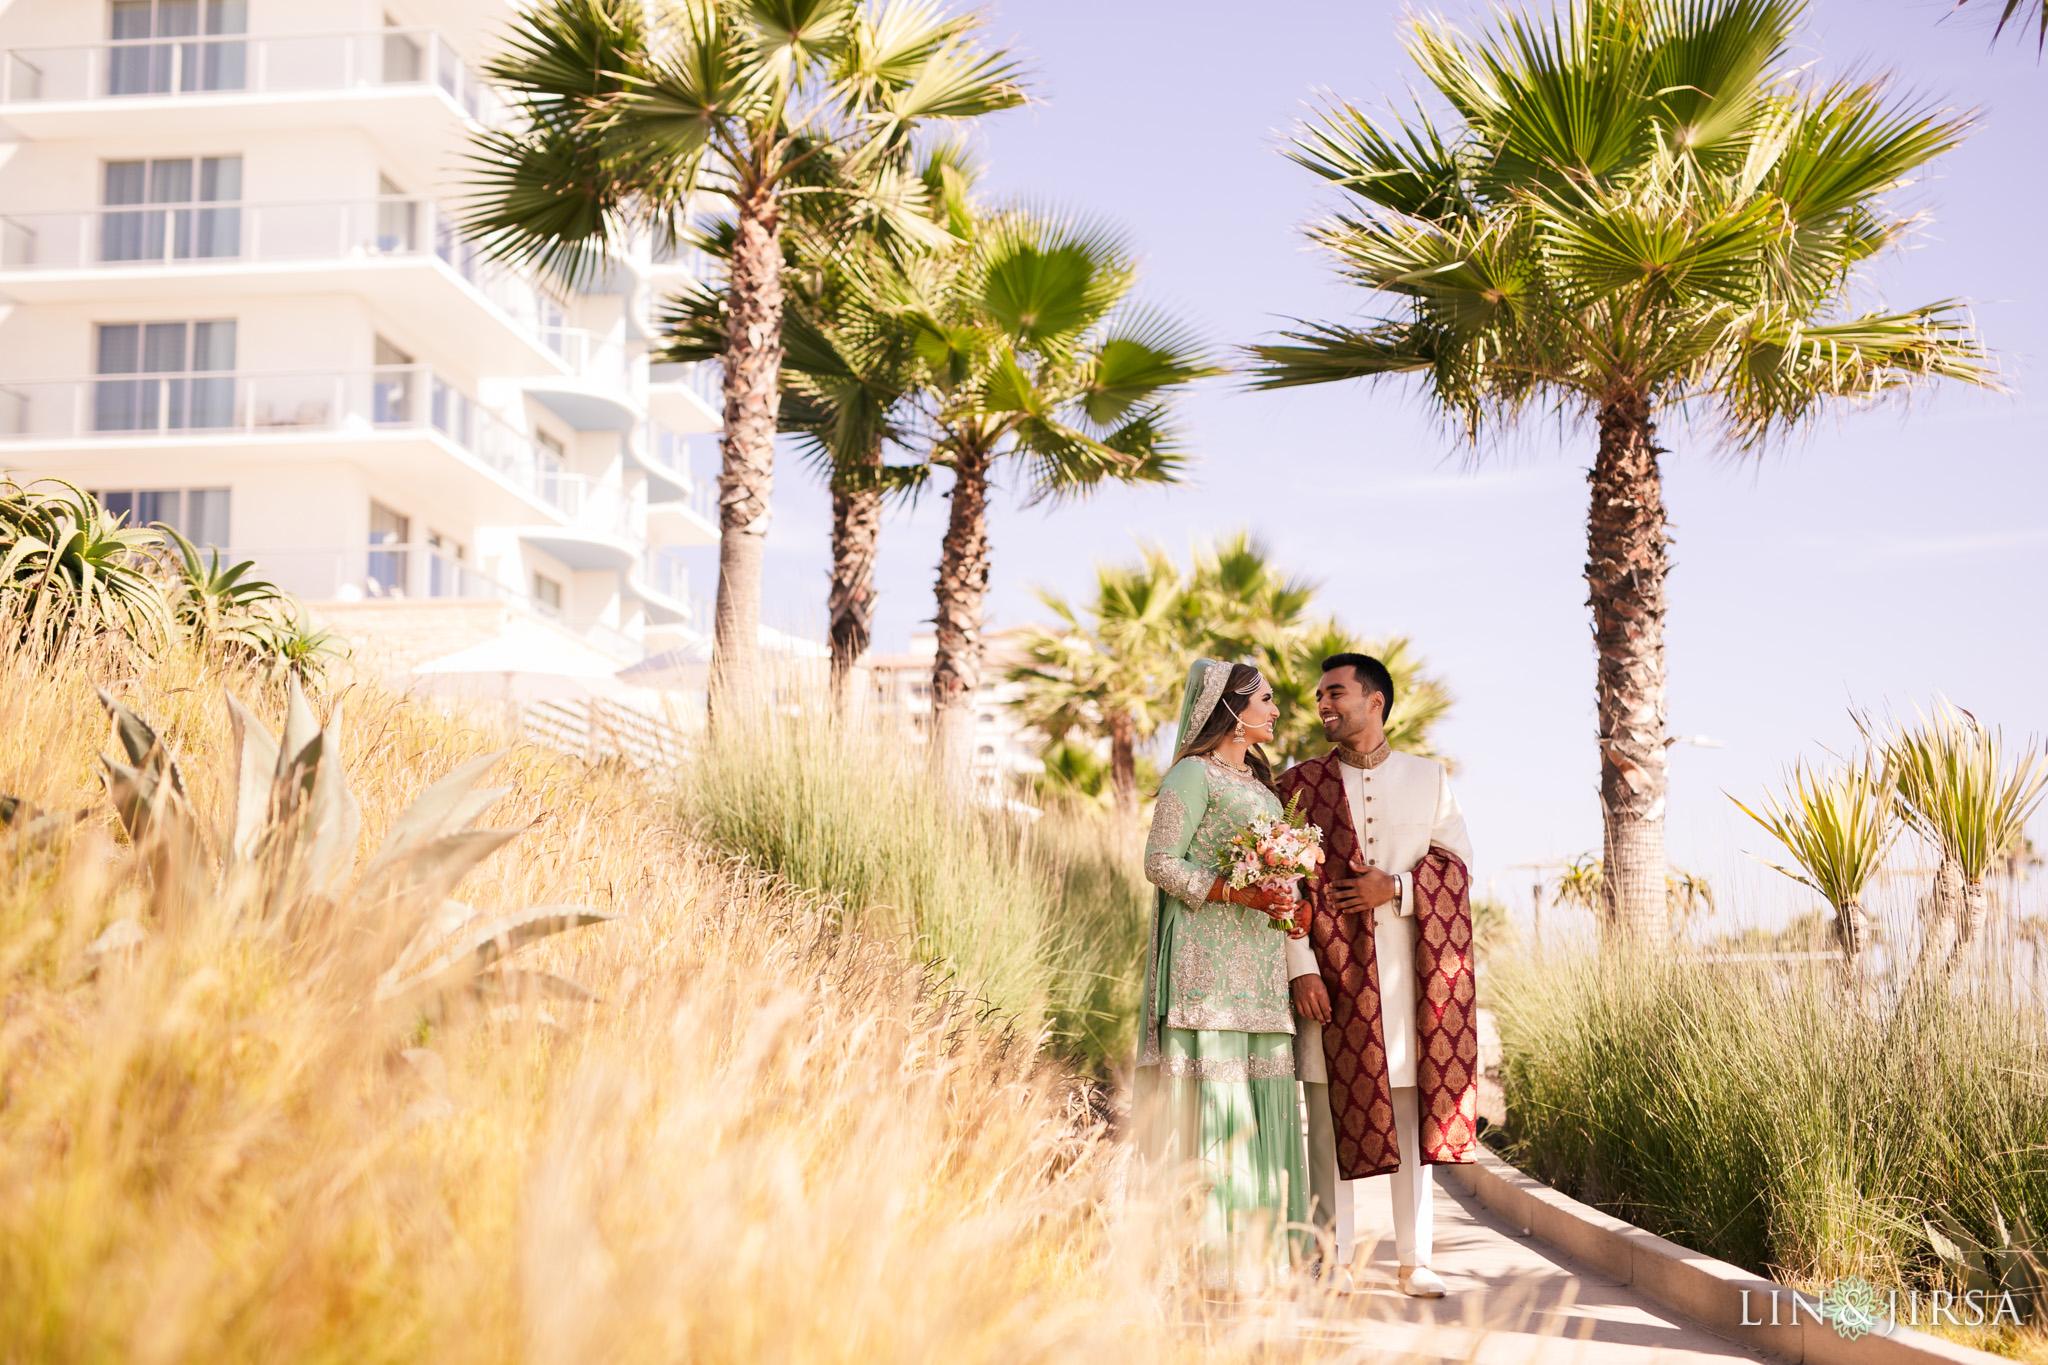 012 pasea hotel huntington beach pakistani muslim wedding photography